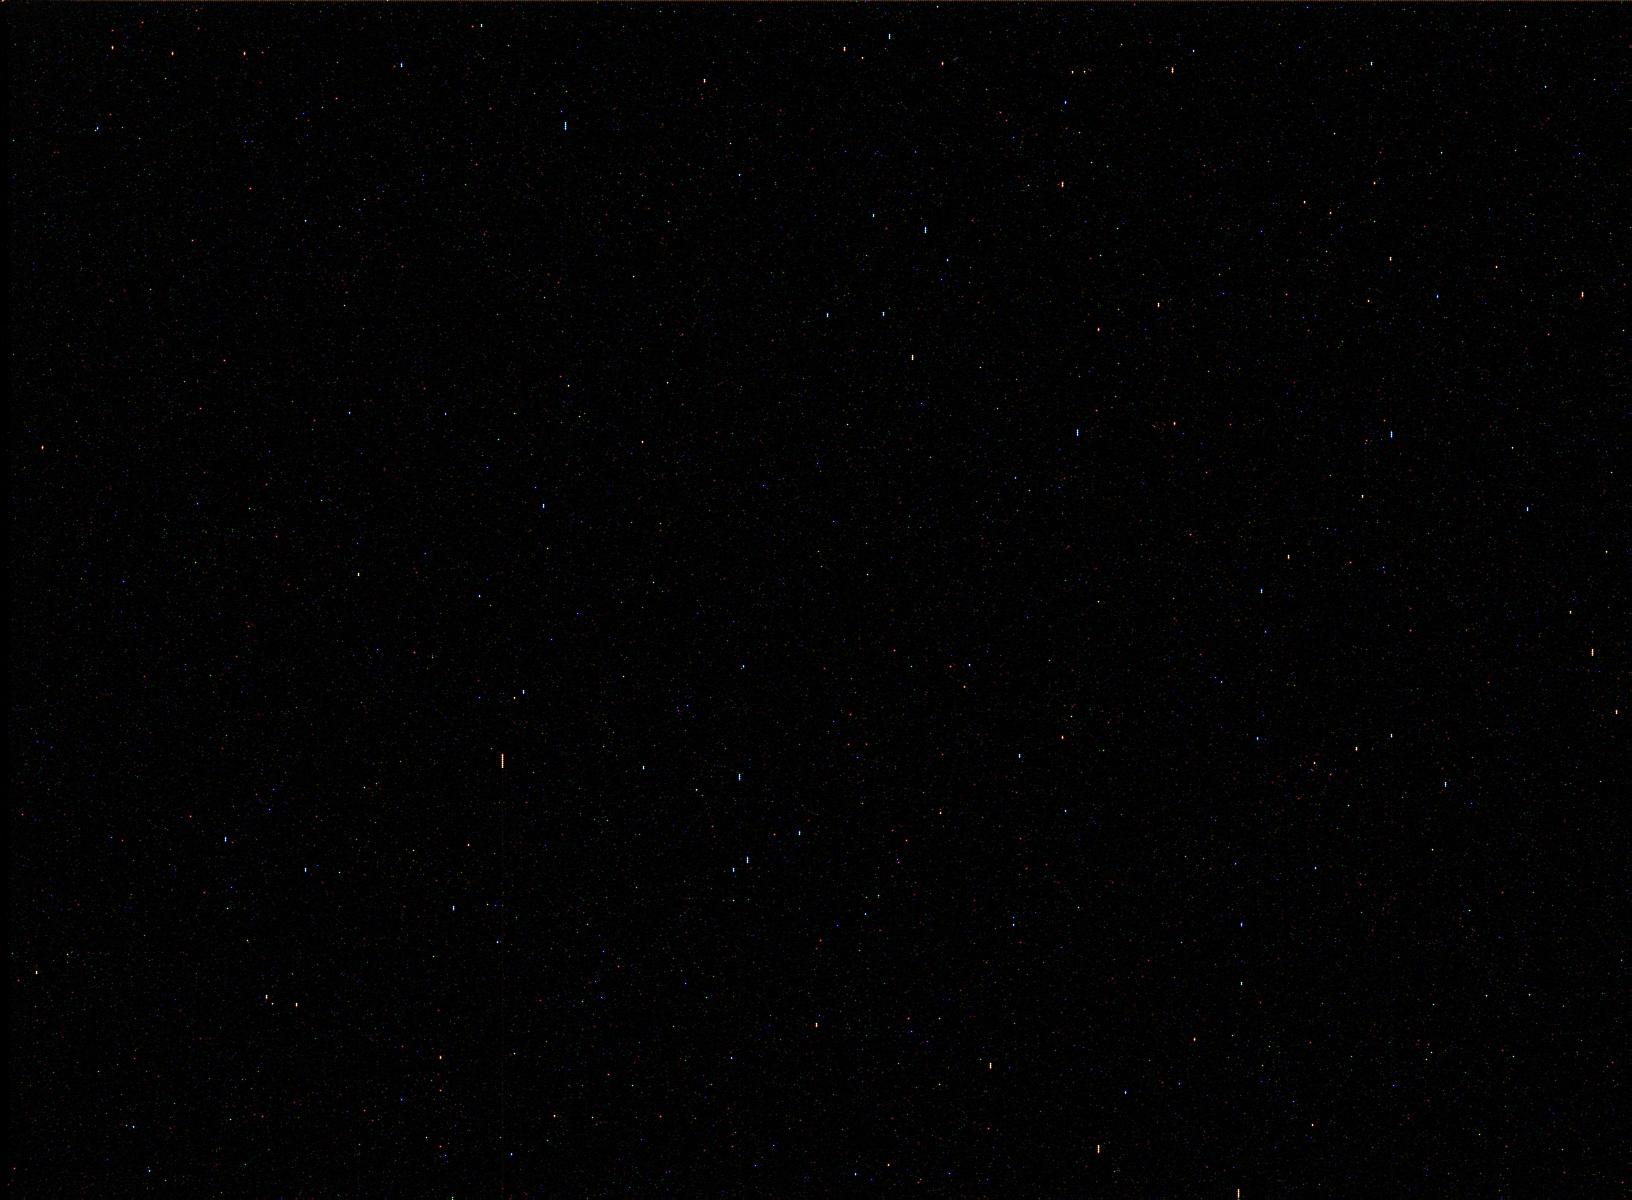 Ночное небо Марса, снимок марсохода Curiosity